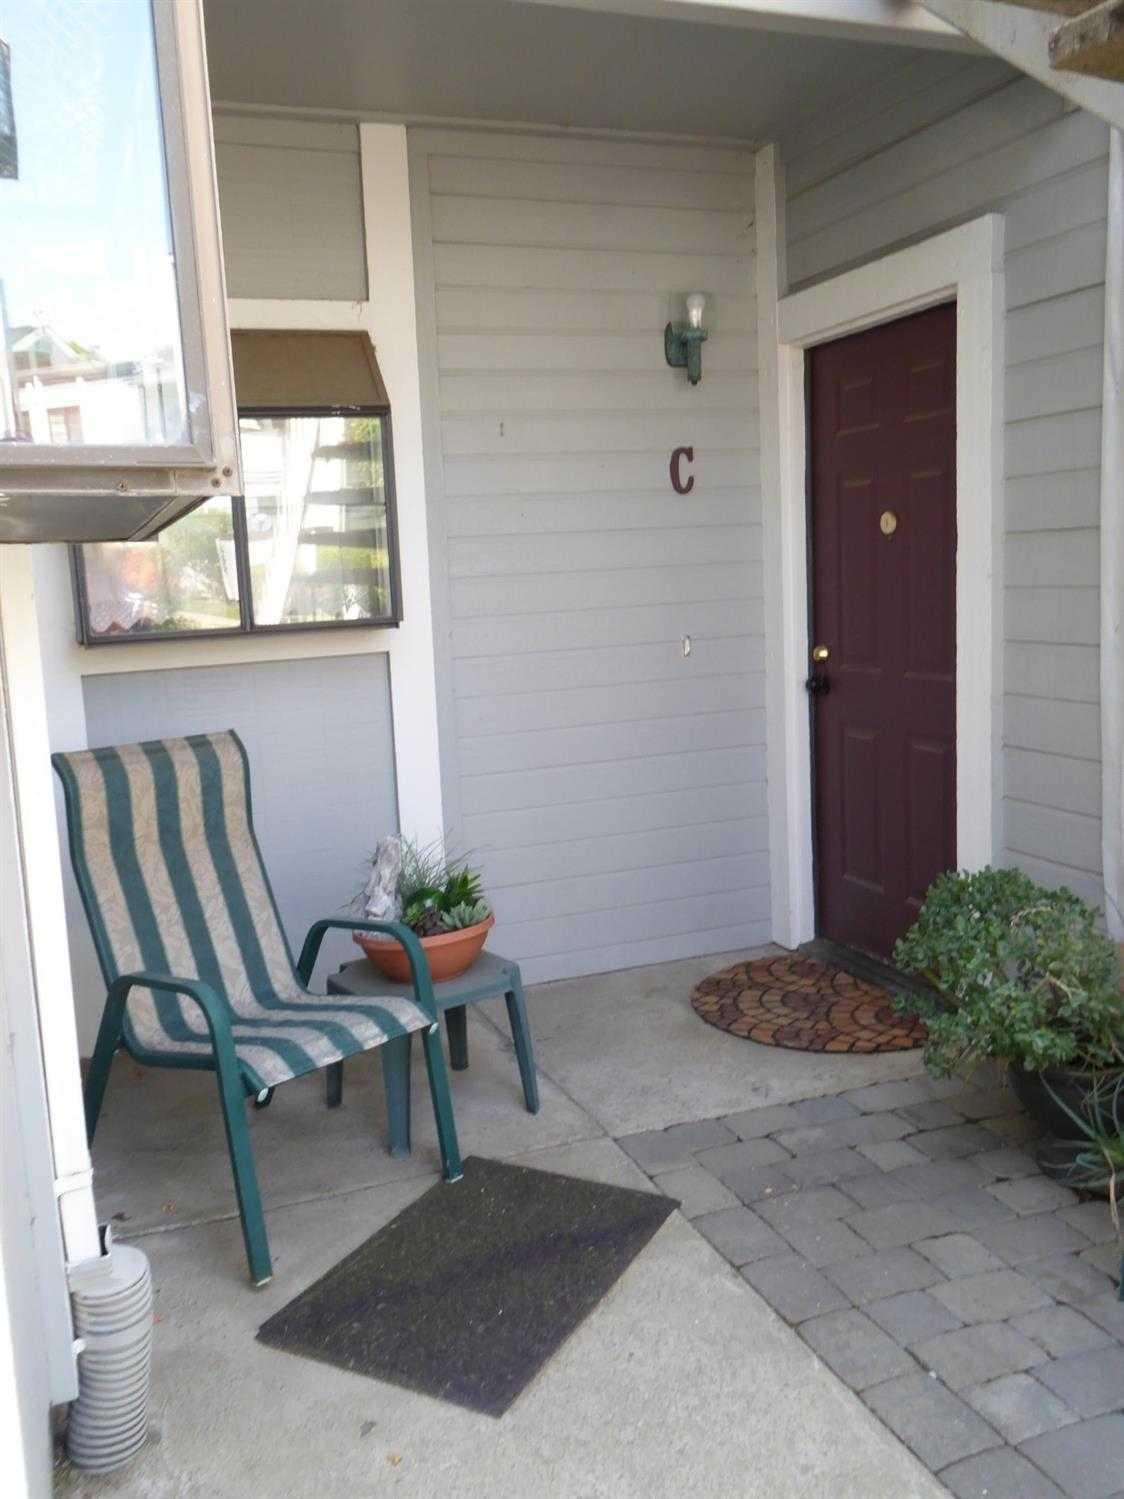 7405 Auburn Oaks Ct Apt C Citrus Heights, CA 95621